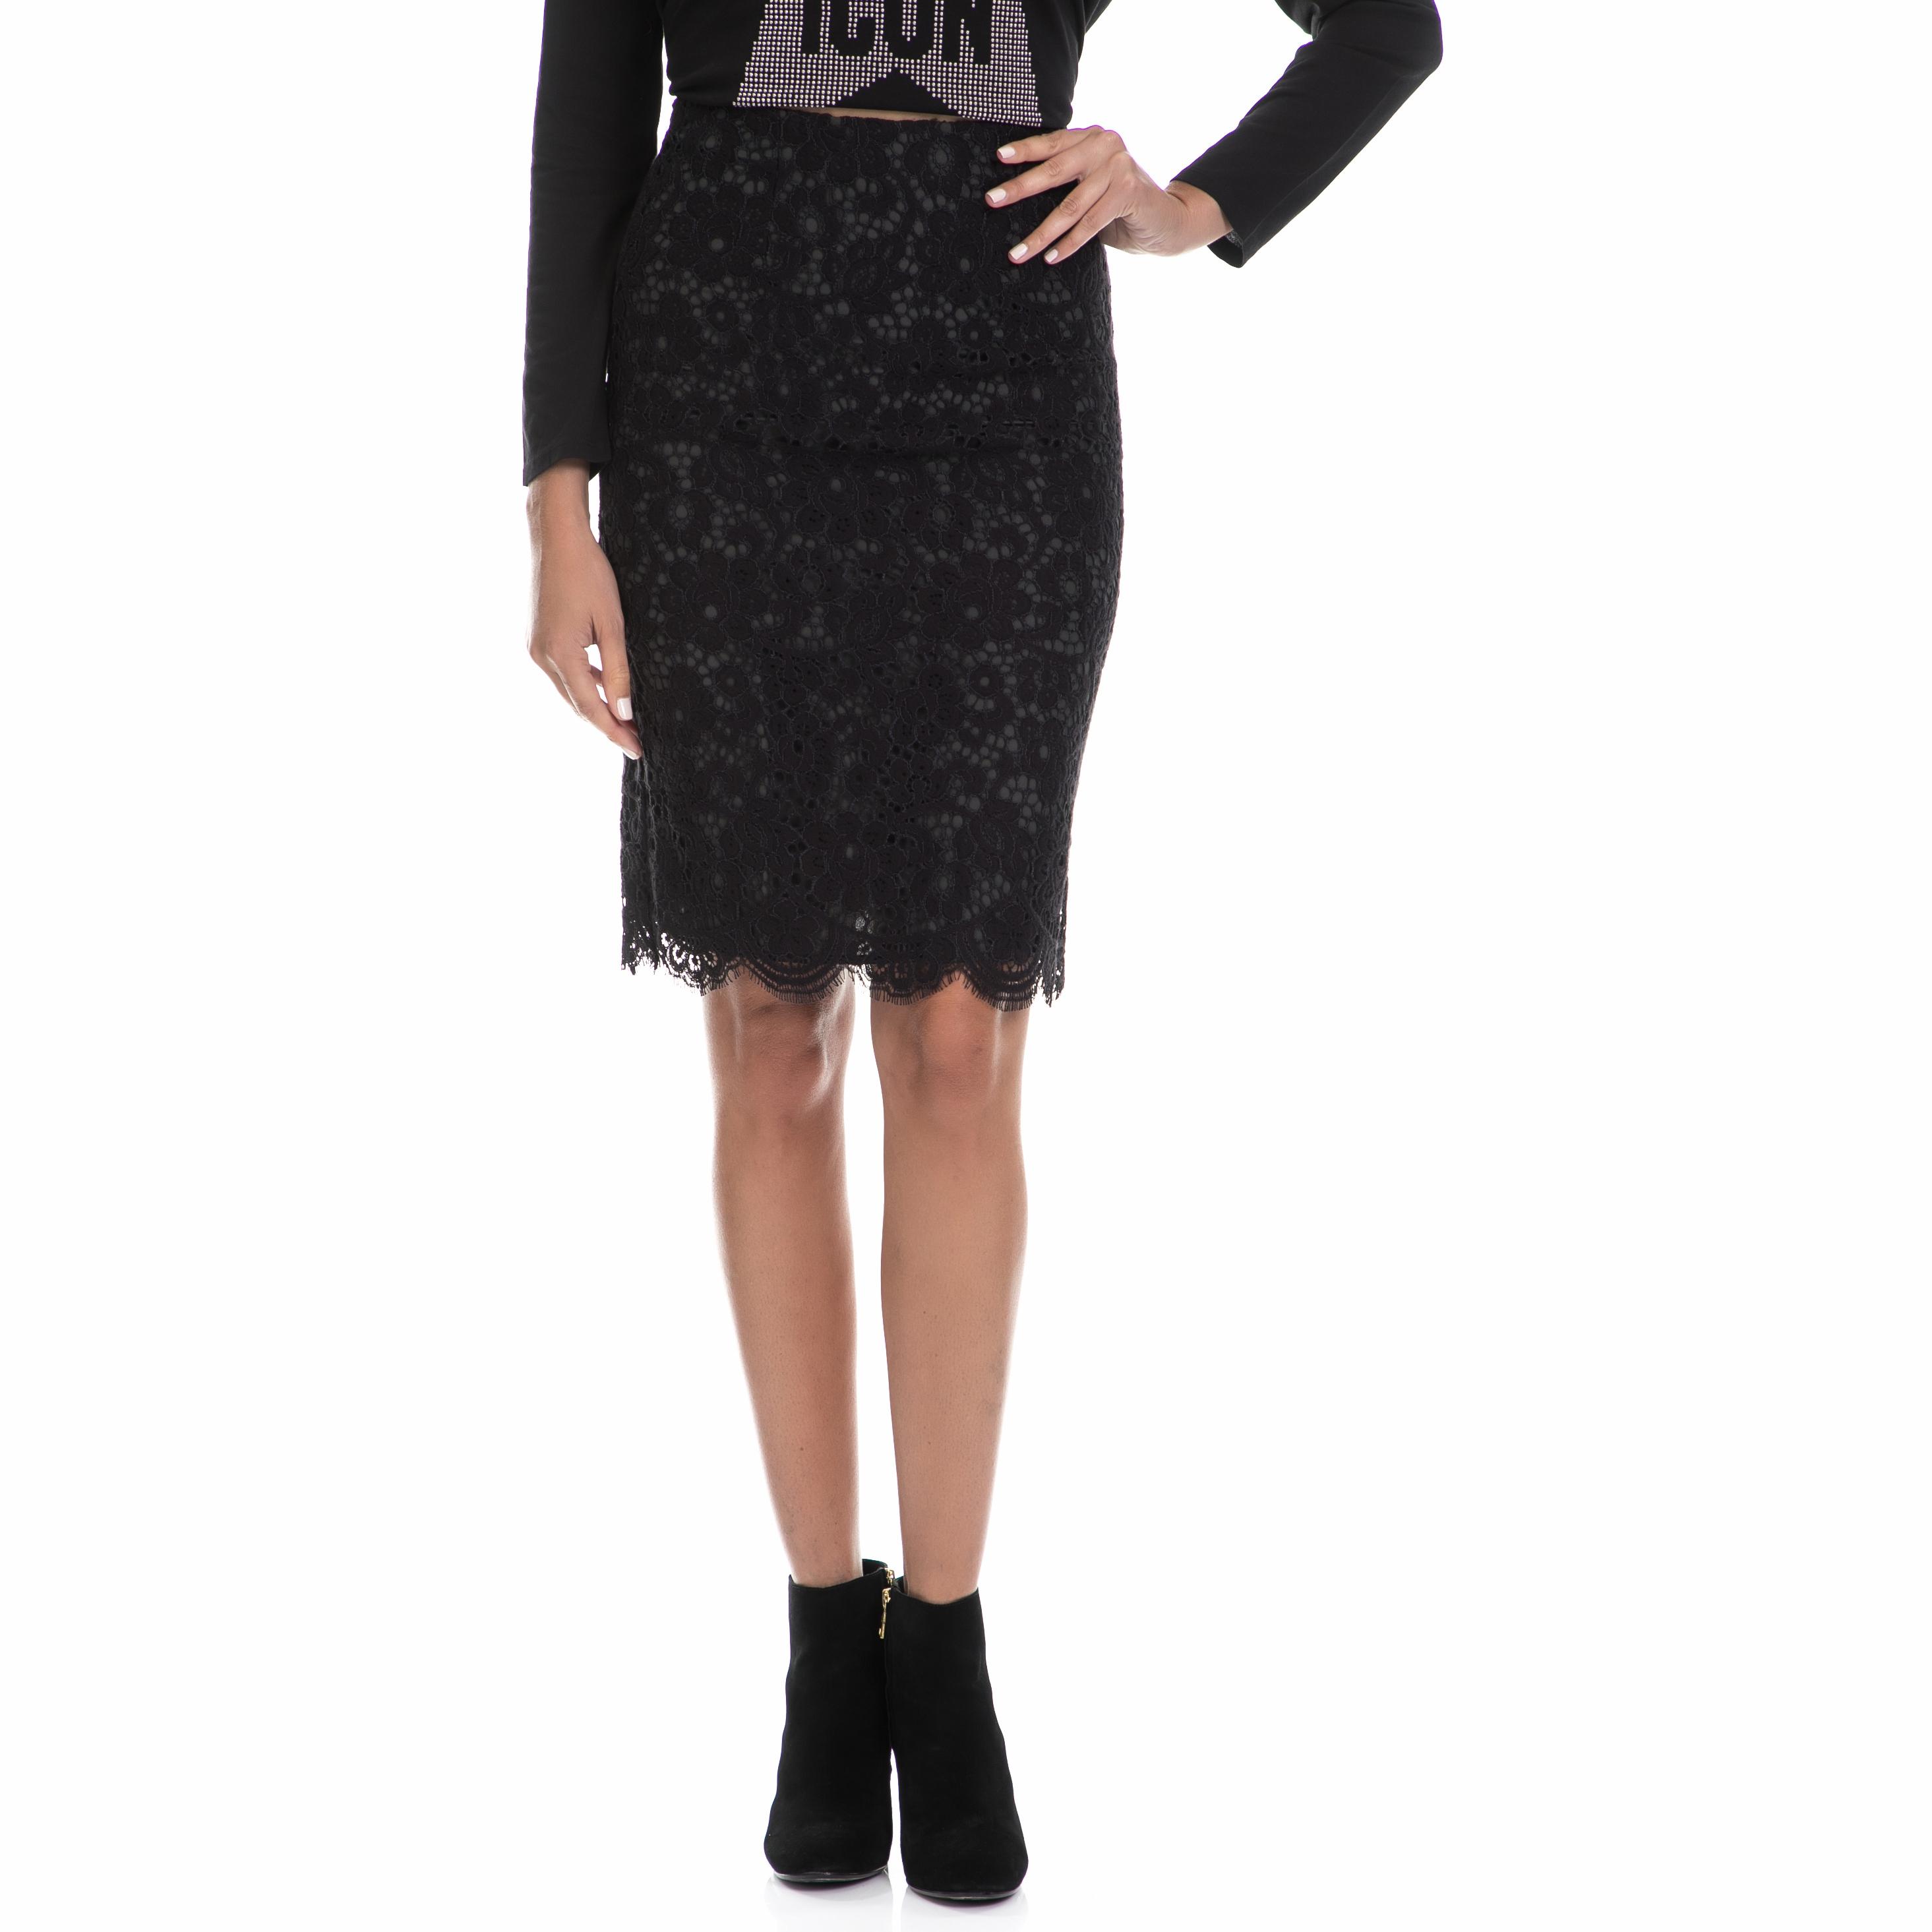 JUICY COUTURE - Γυναικεία φούστα BUCHAREST FLORAL LACE μαύρη γυναικεία ρούχα φούστες μέχρι το γόνατο